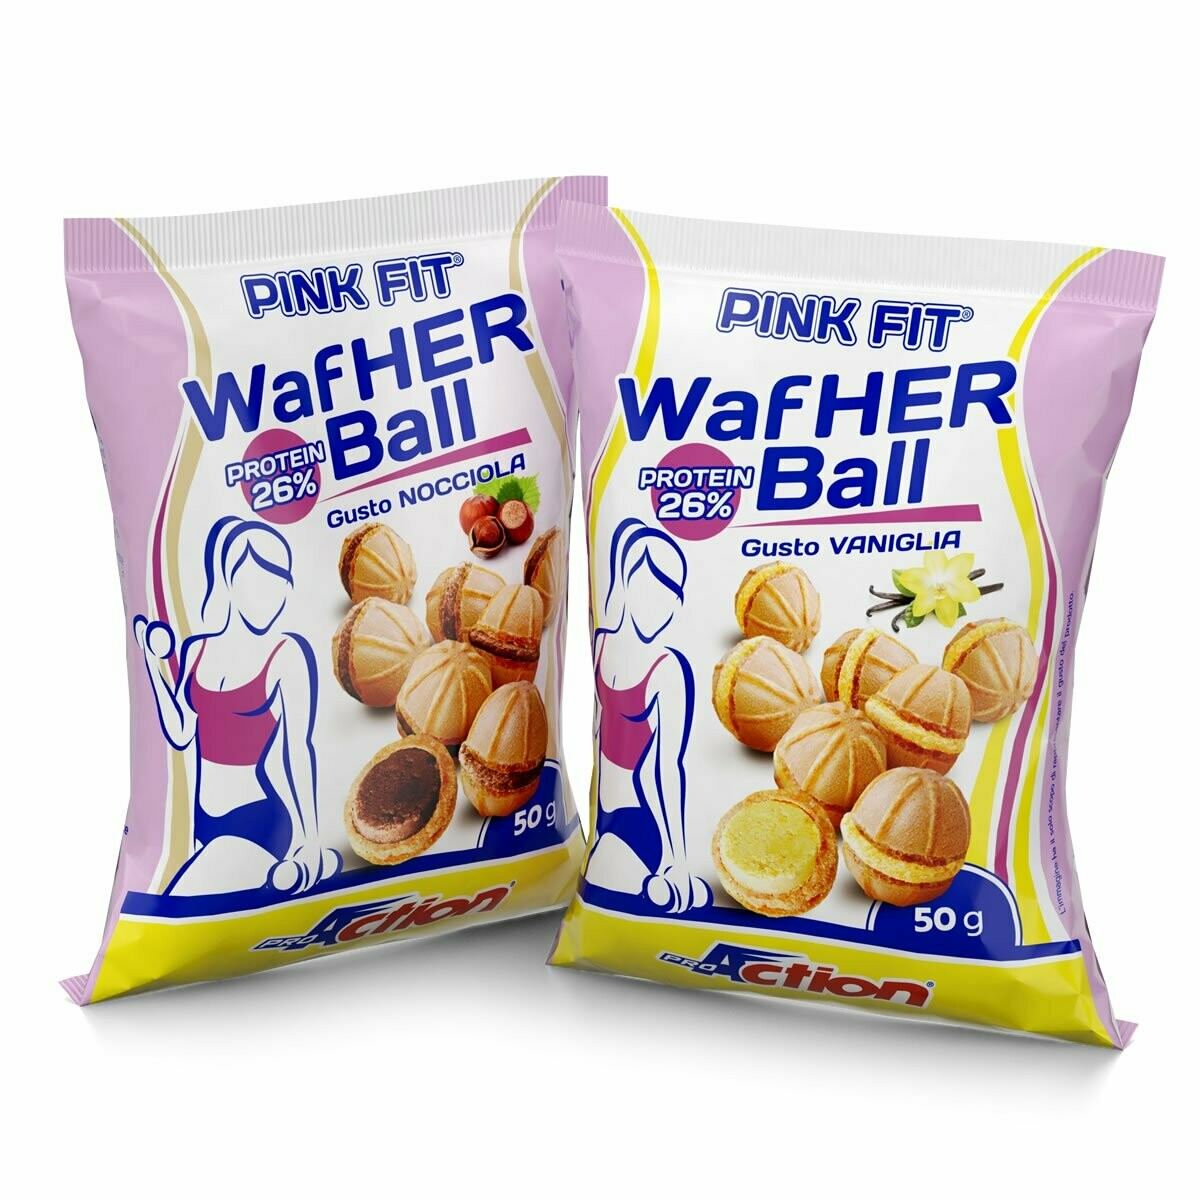 Pink Fit Wafher BALL